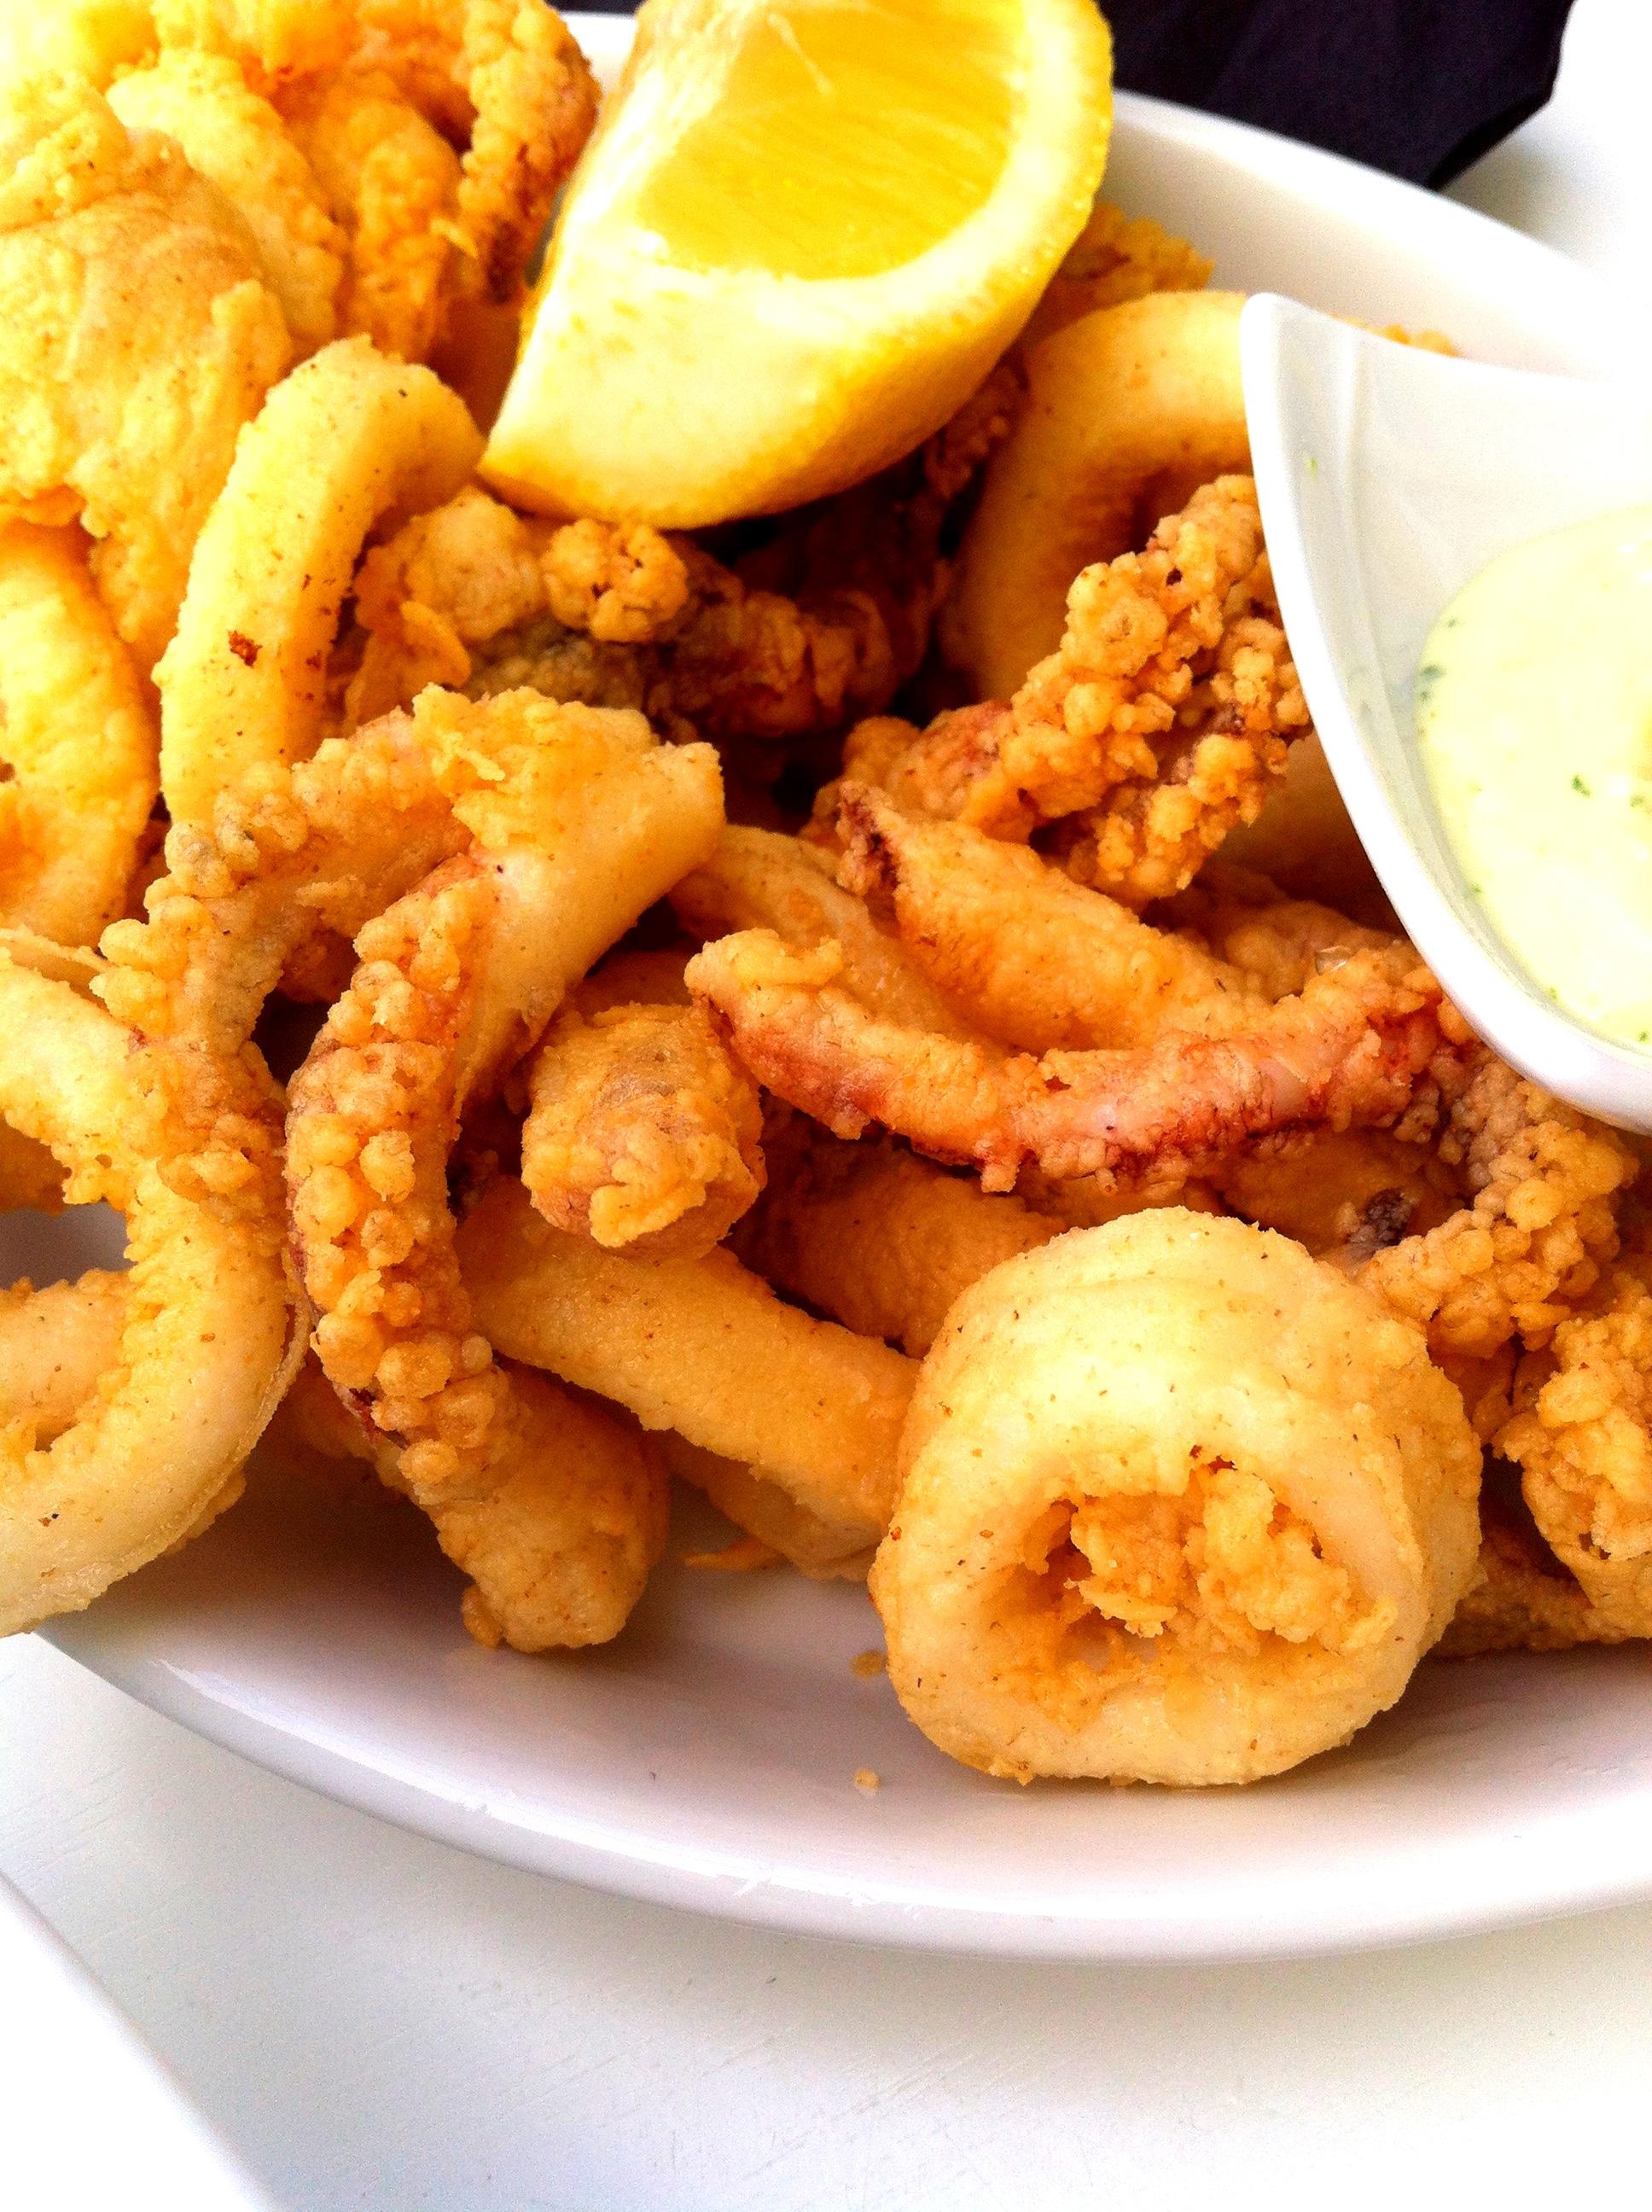 Calamari frito Southbeach Marbella andrew forbes